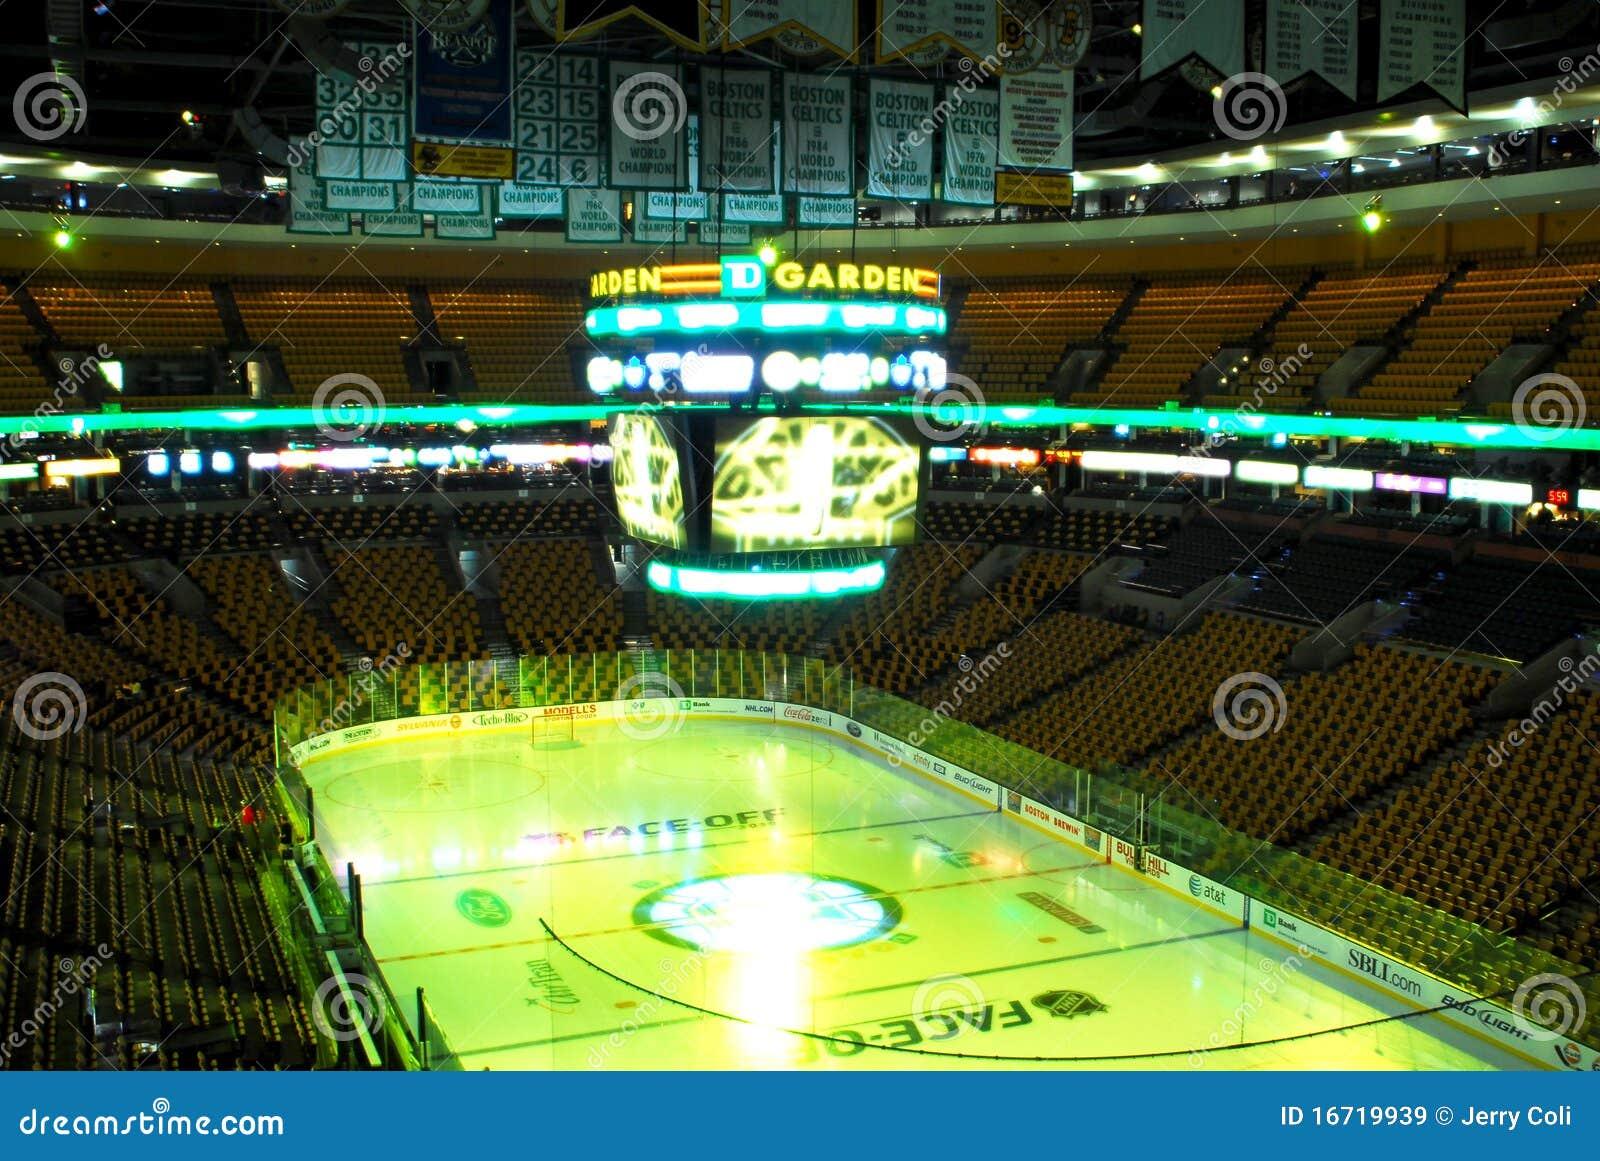 Td Garden Set Up For Bruins Hockey Editorial Stock Image Image 16719939